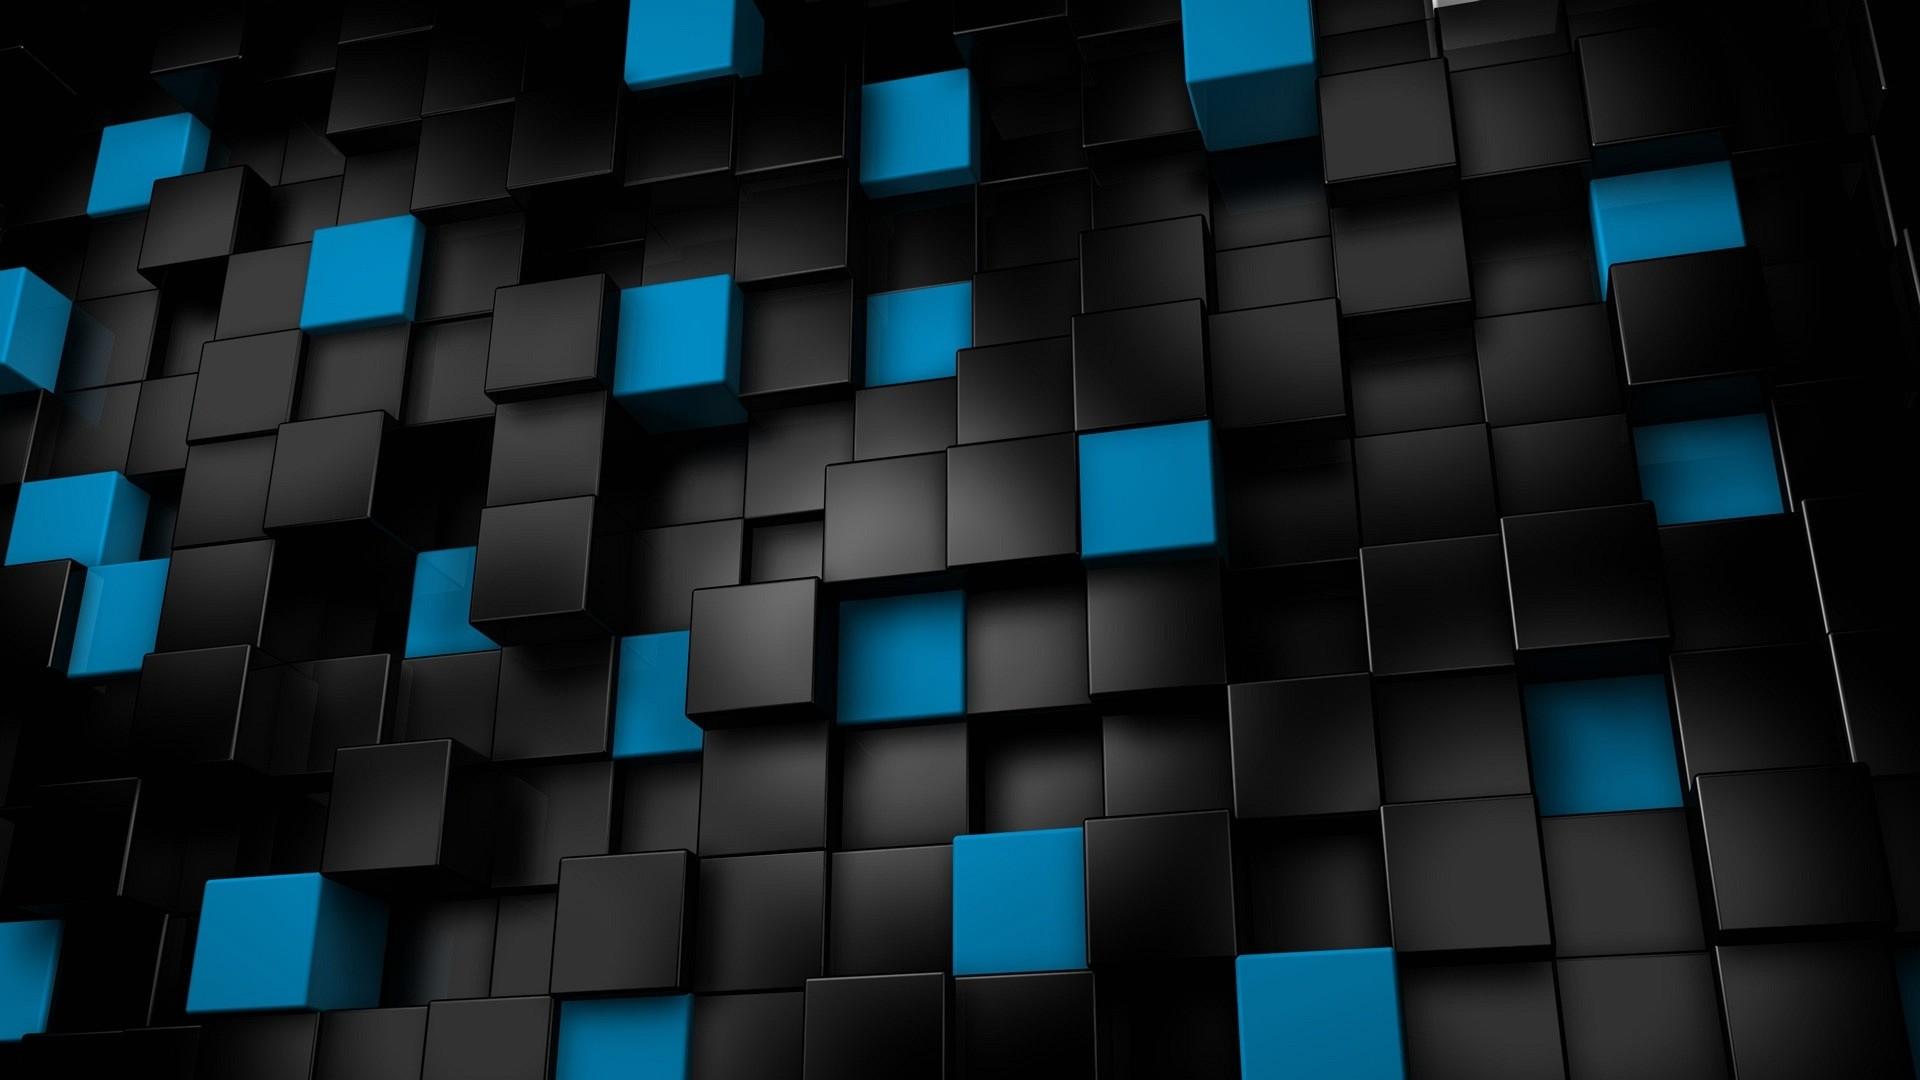 Sfondi Full Hd Desktop Nero 86 Immagini